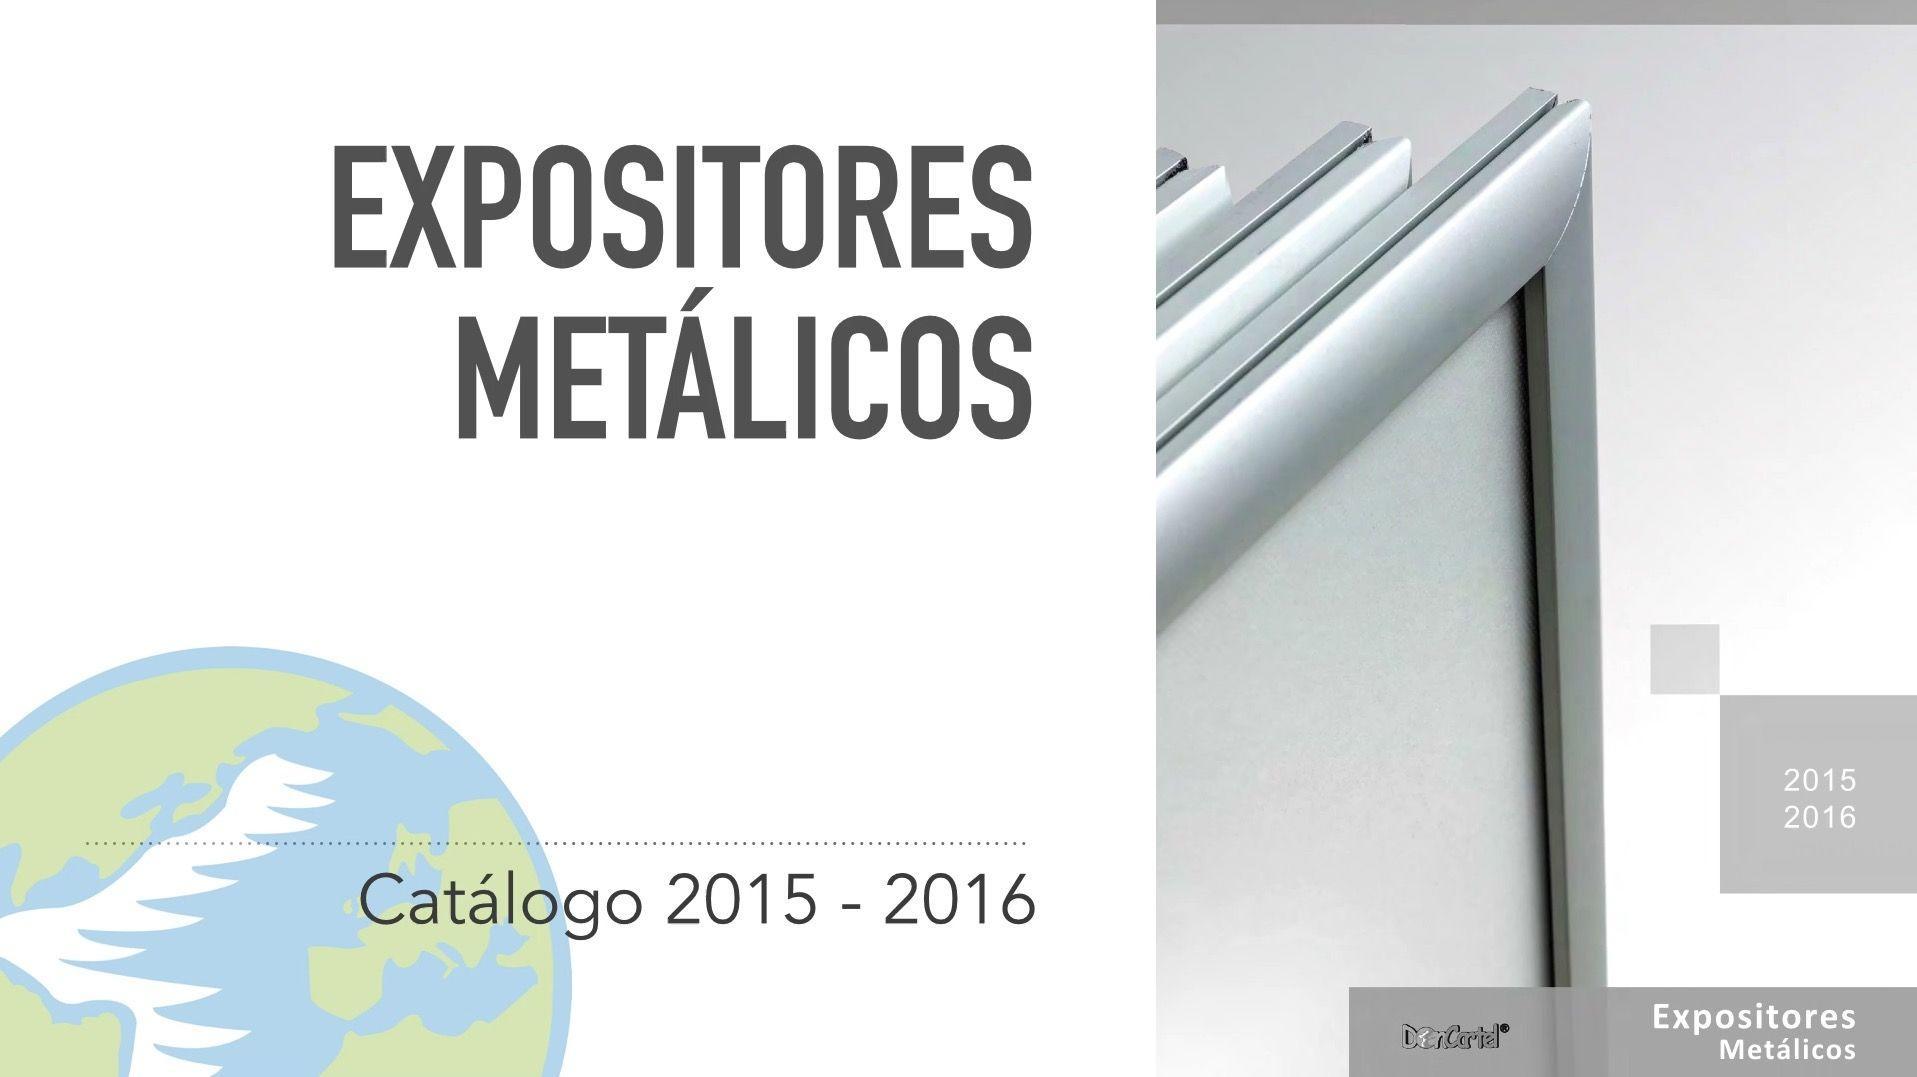 Catálogo Expositores Metálicos nuevo video catálogo